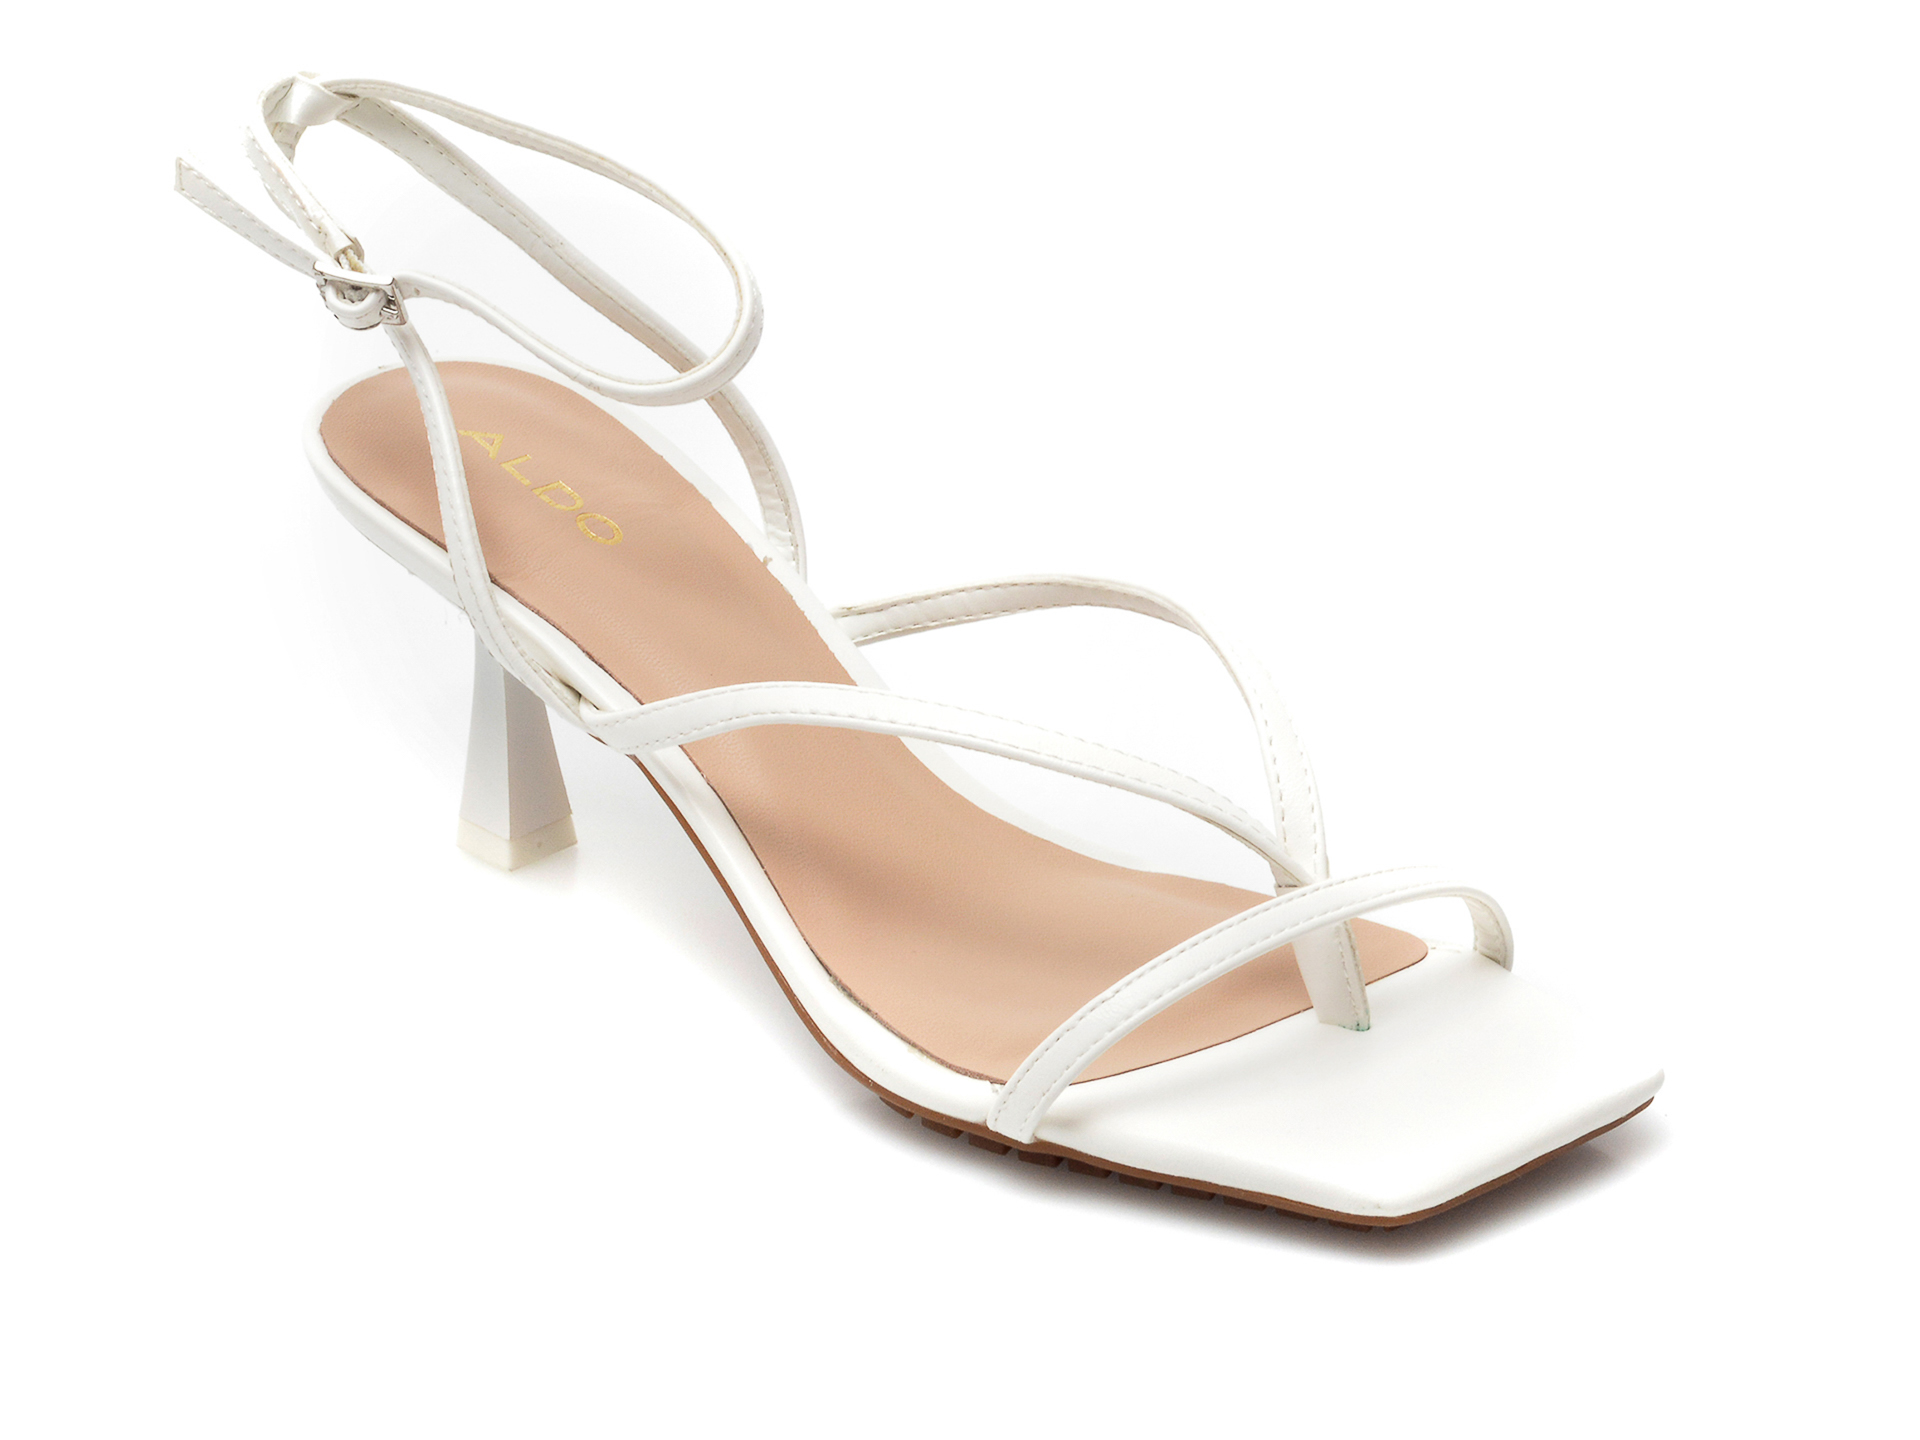 Sandale ALDO albe, Kaviel100, din piele ecologica imagine otter.ro 2021